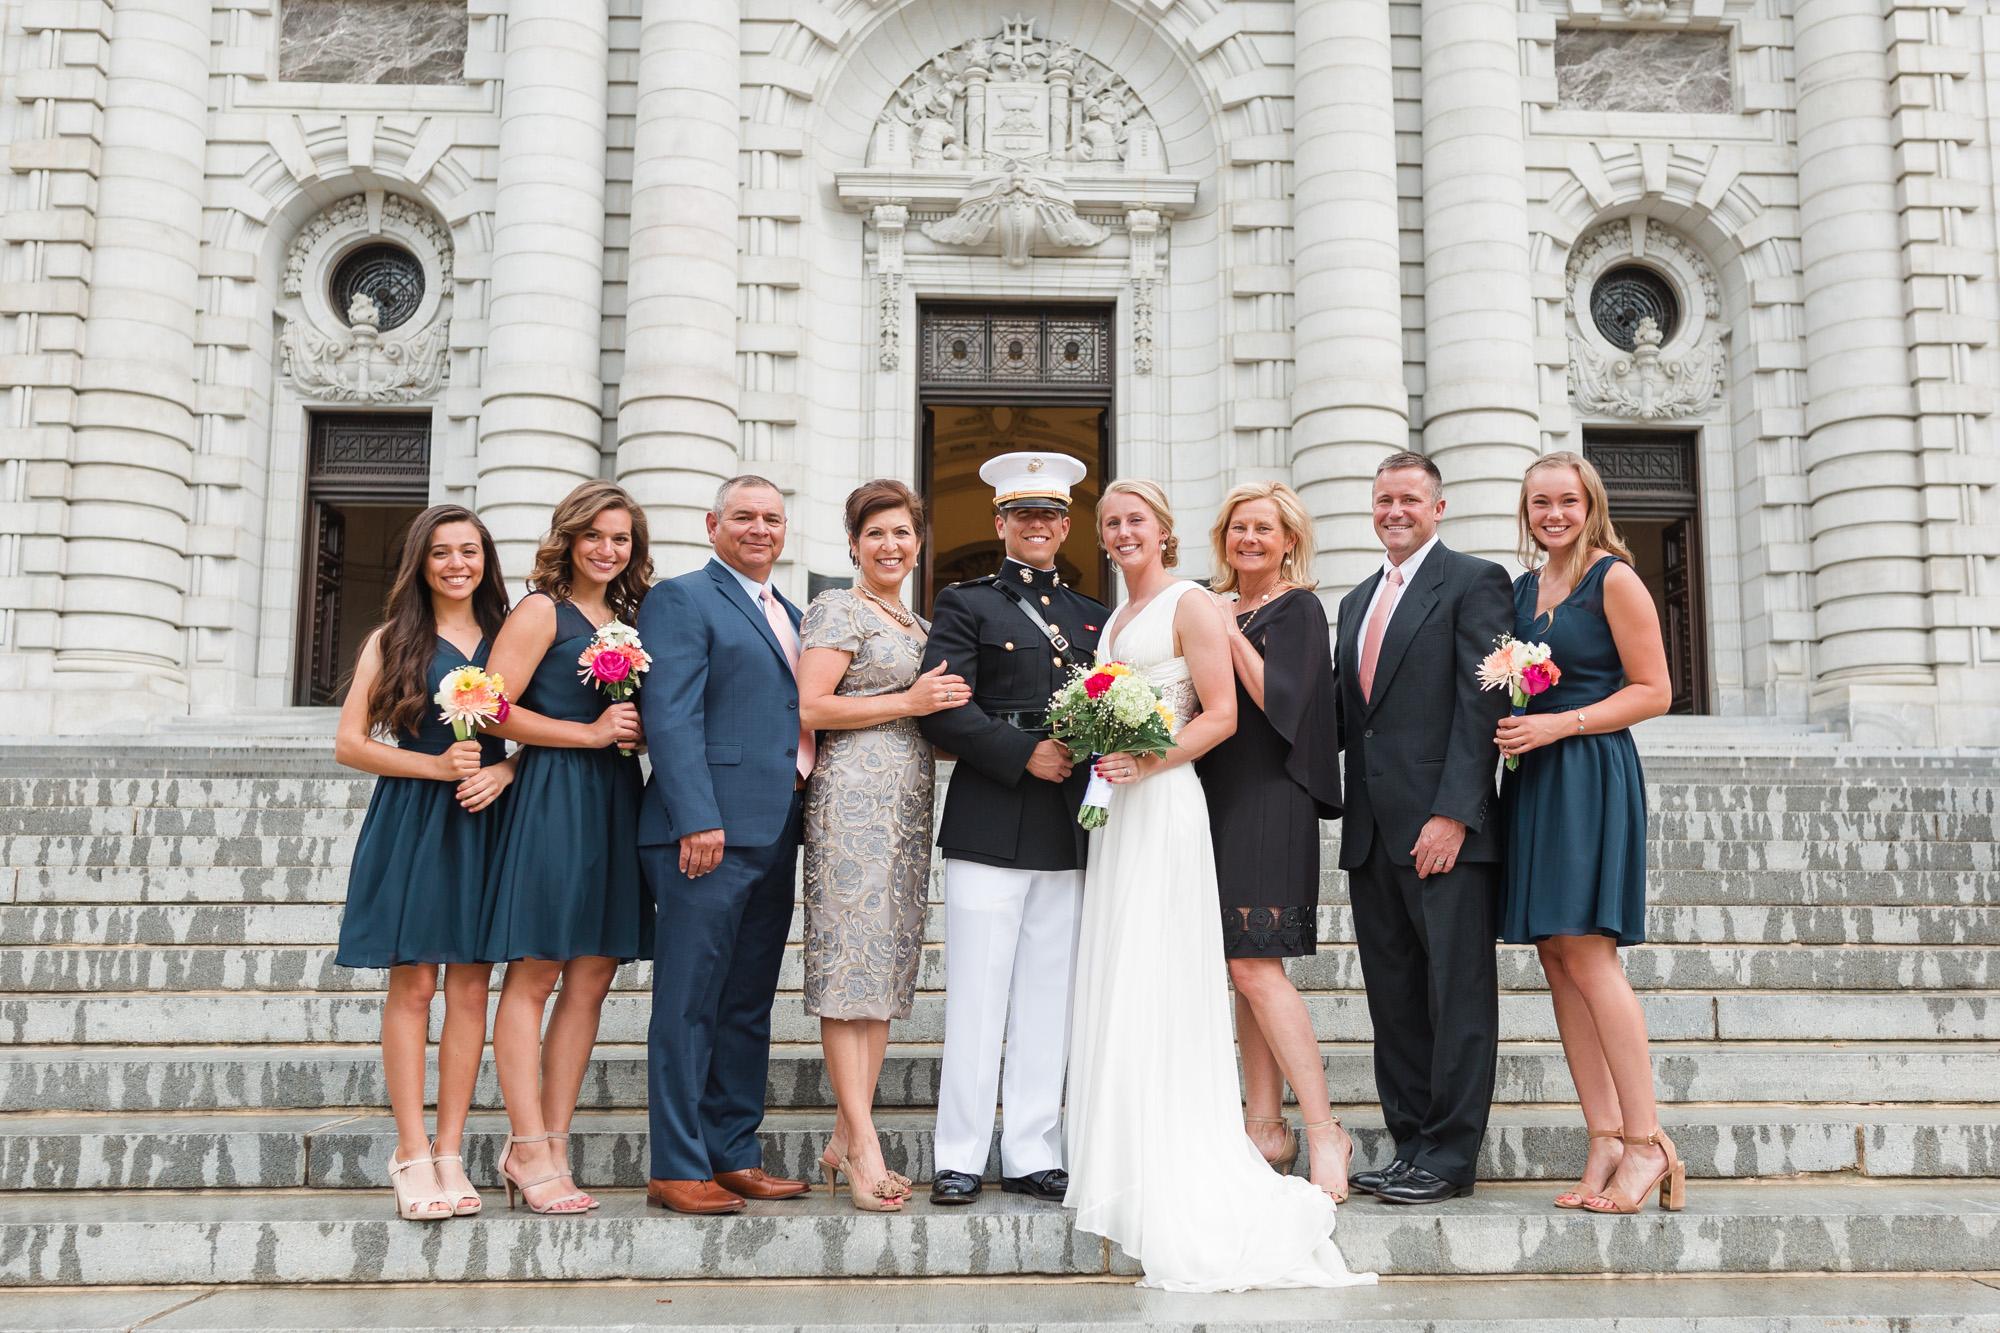 2017_05_27_ray_caroline_naval_wedding-6624.jpg